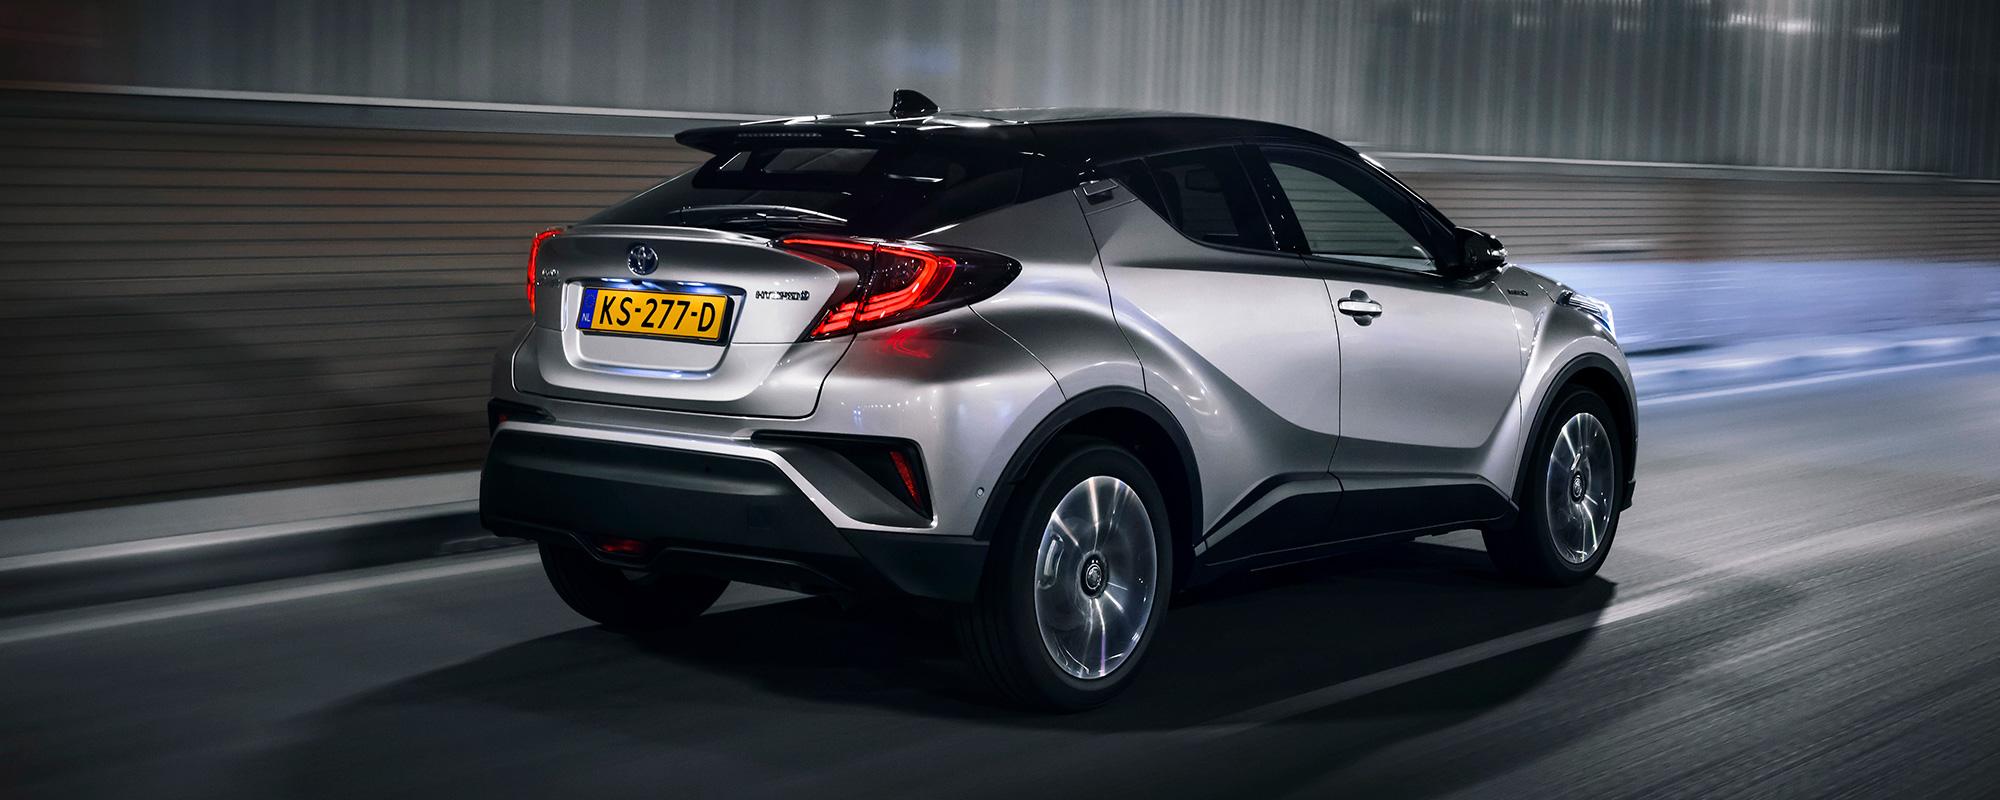 Nieuwe Toyota C-HR behaalt maximale score in Euro NCAP